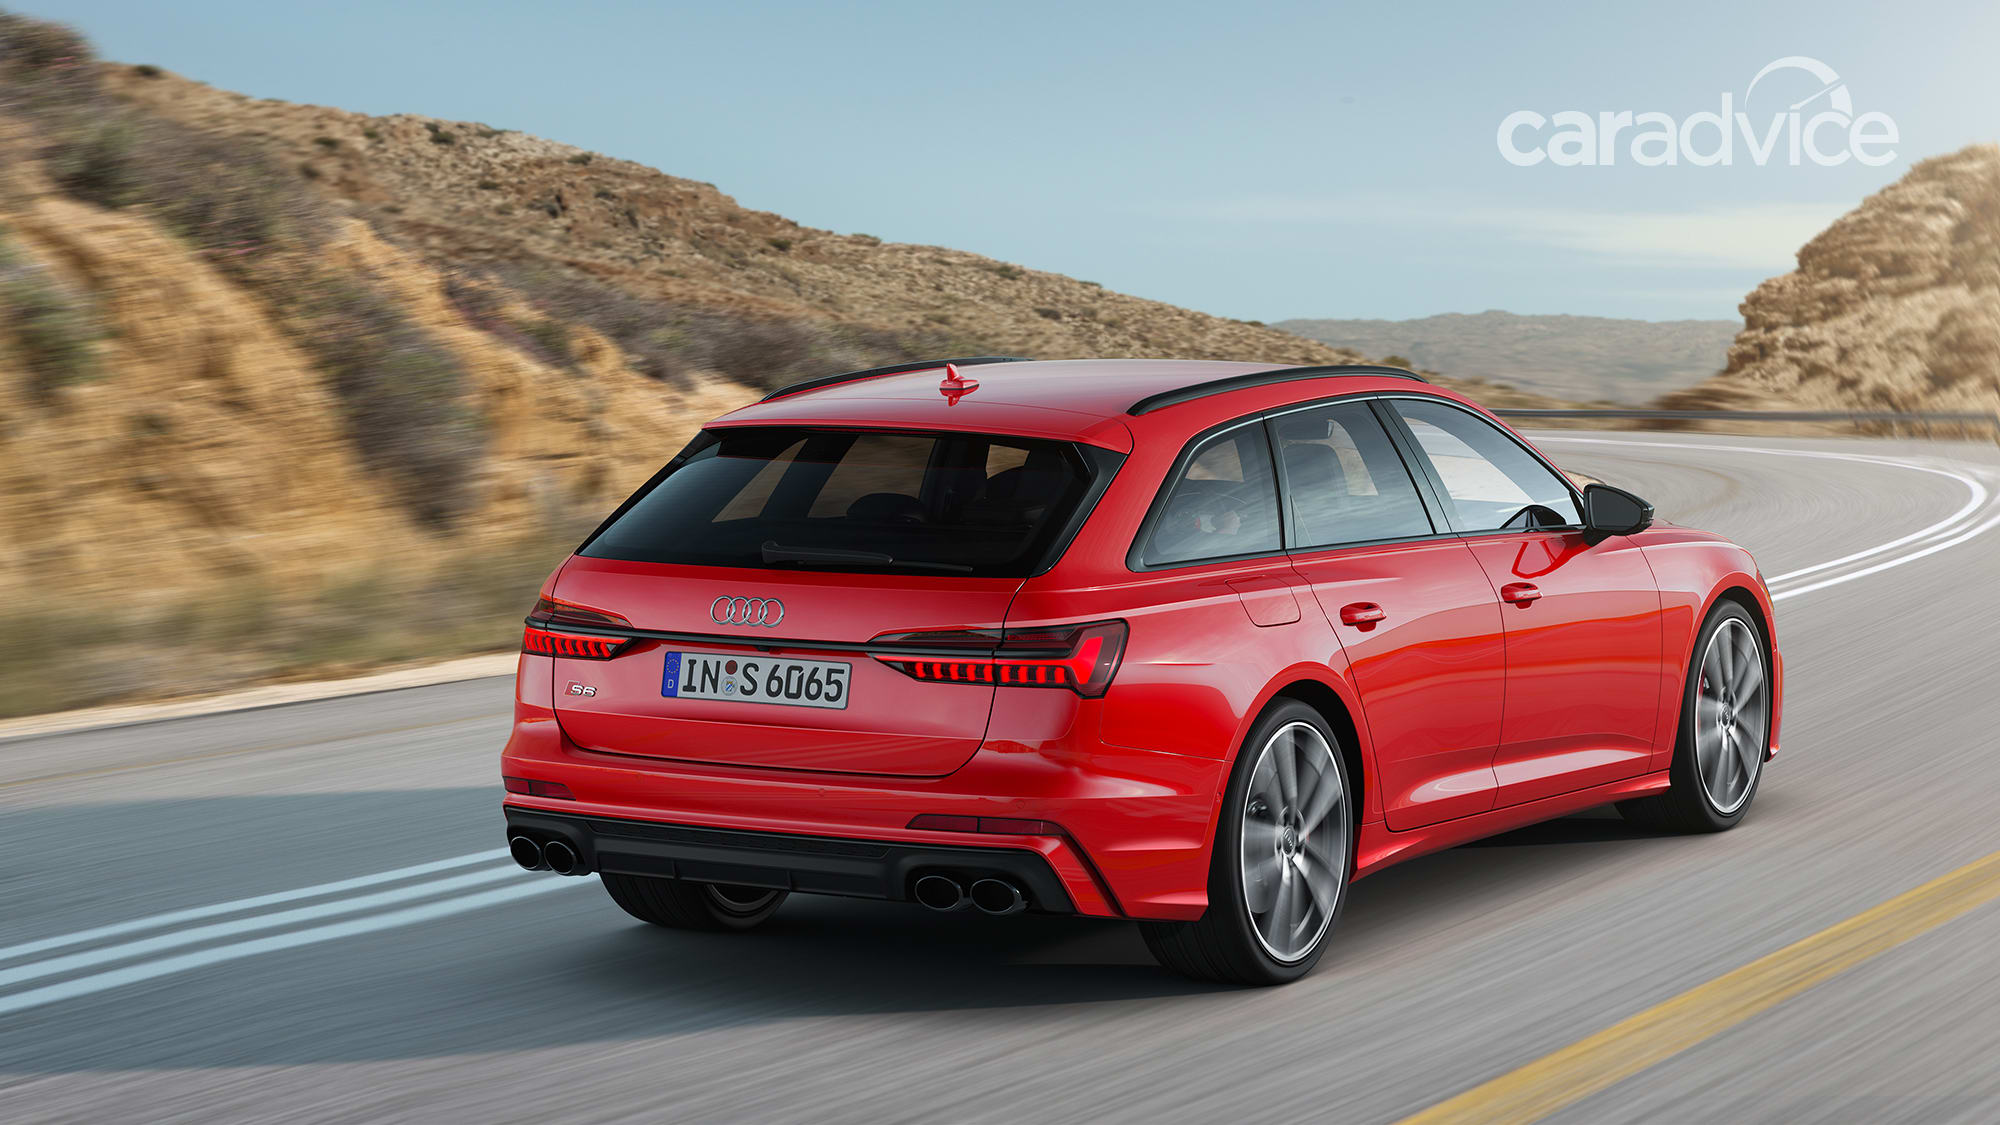 2017 - [Audi] A6 Berline & Avant [C8] - Page 11 Hpdt5ibbplouc2keuhth